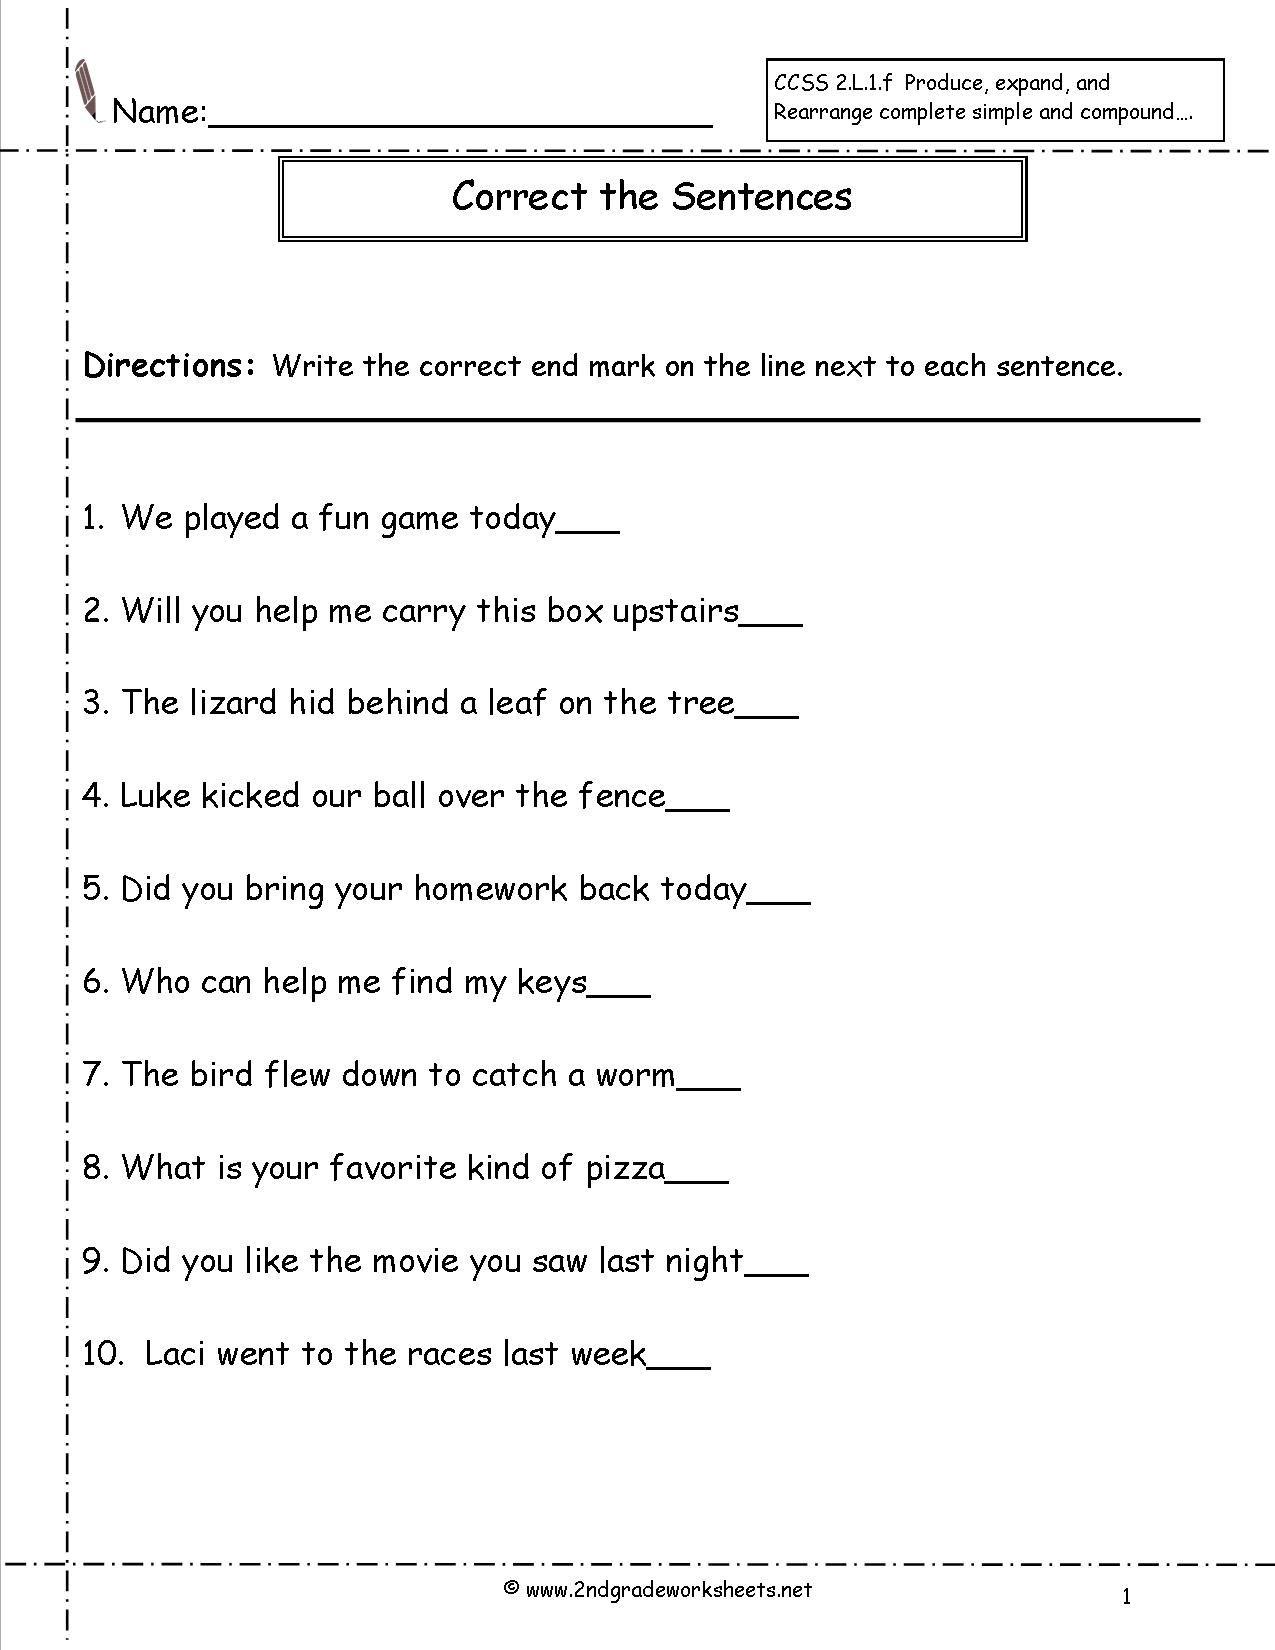 hight resolution of Finding Onomatopoeia Worksheet   Ks3 English Worksheets